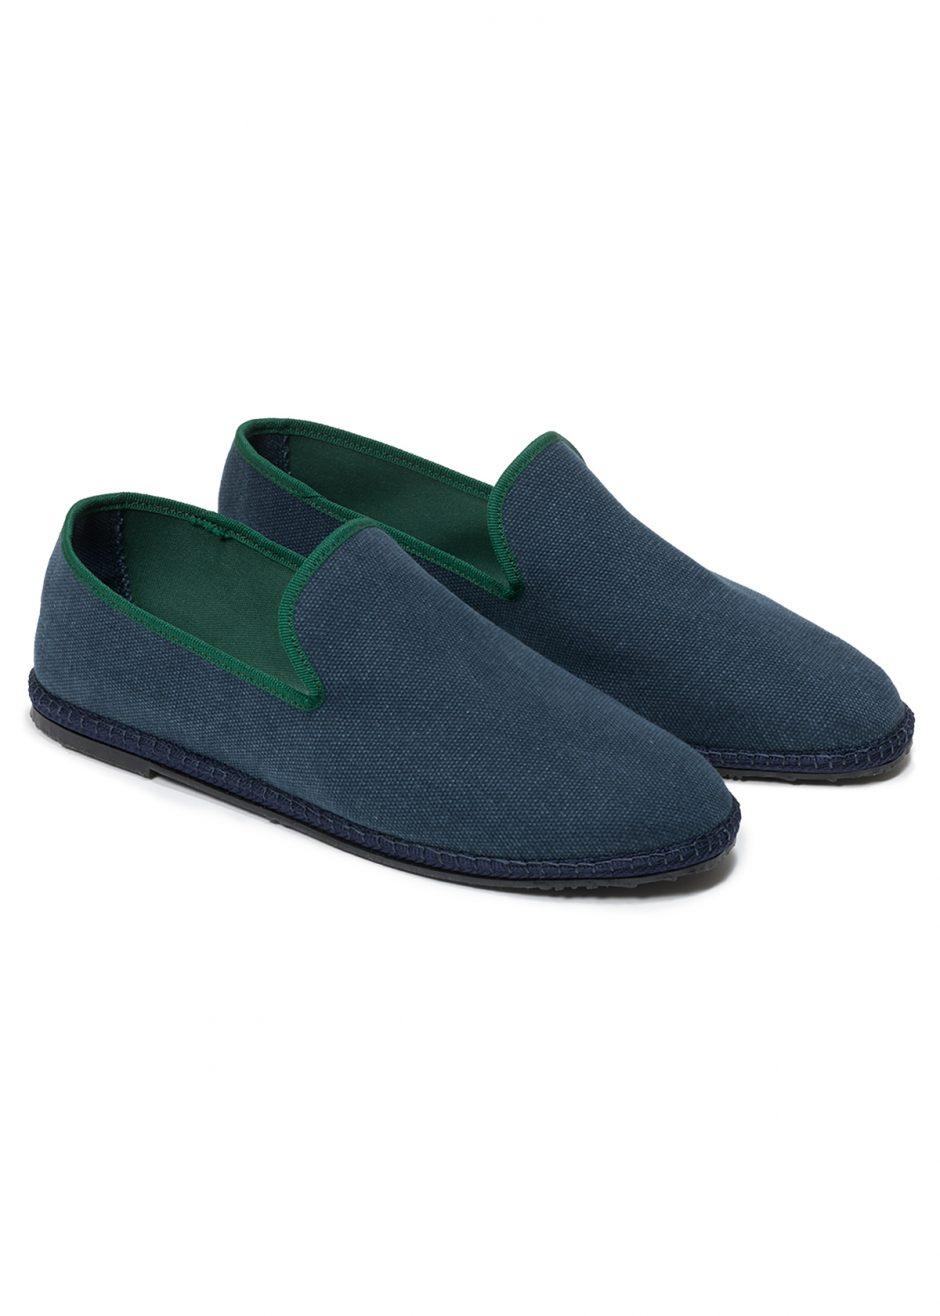 Capri – Furlana blue cotton